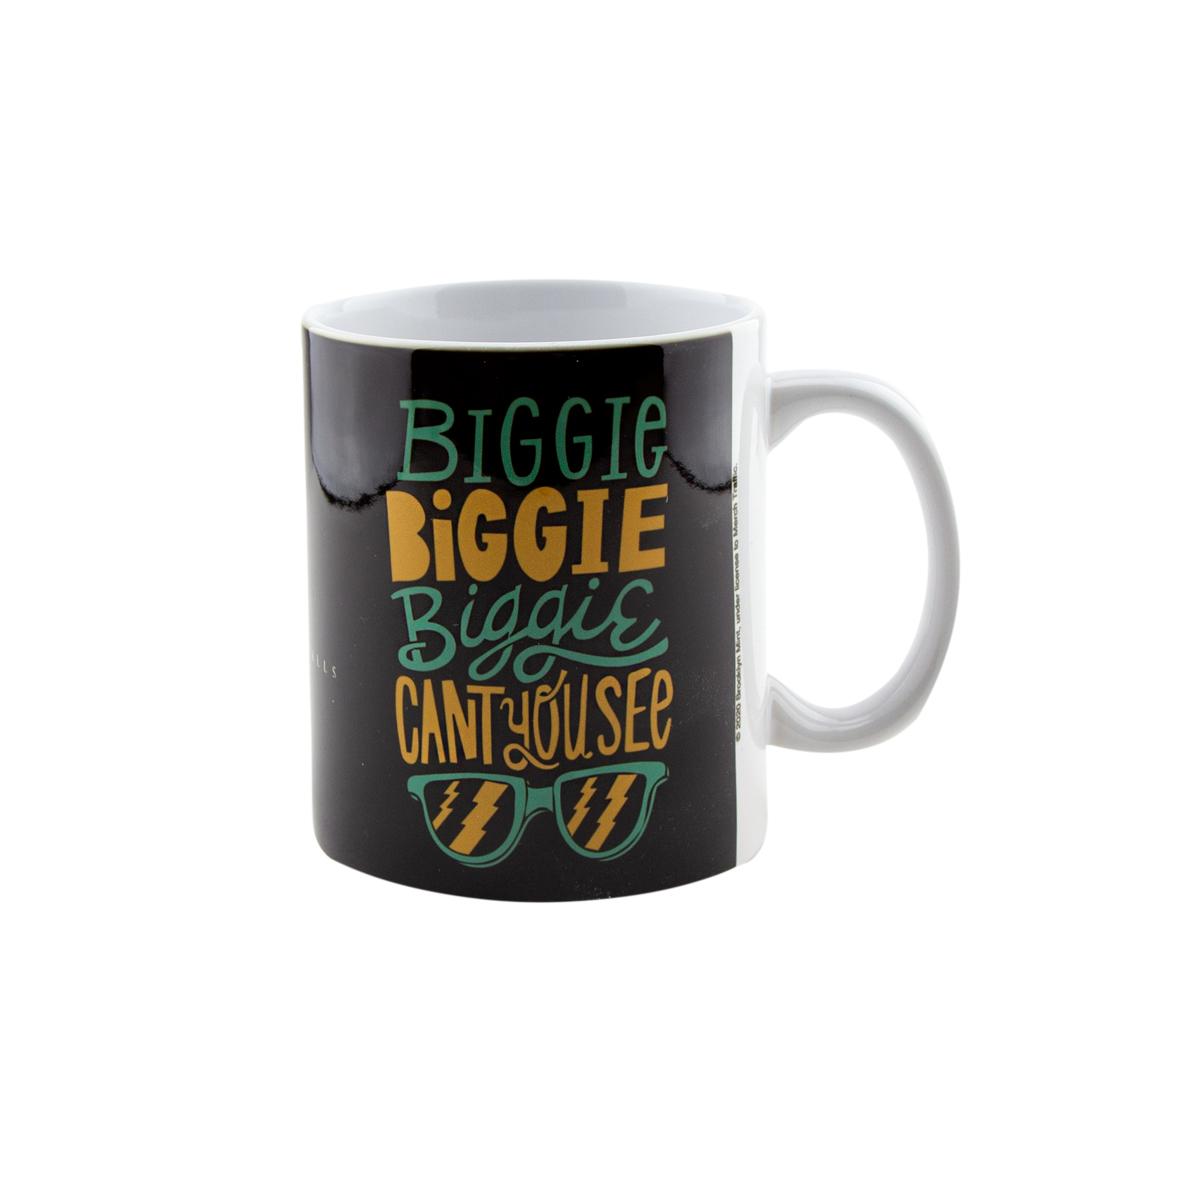 Can't You See Mug